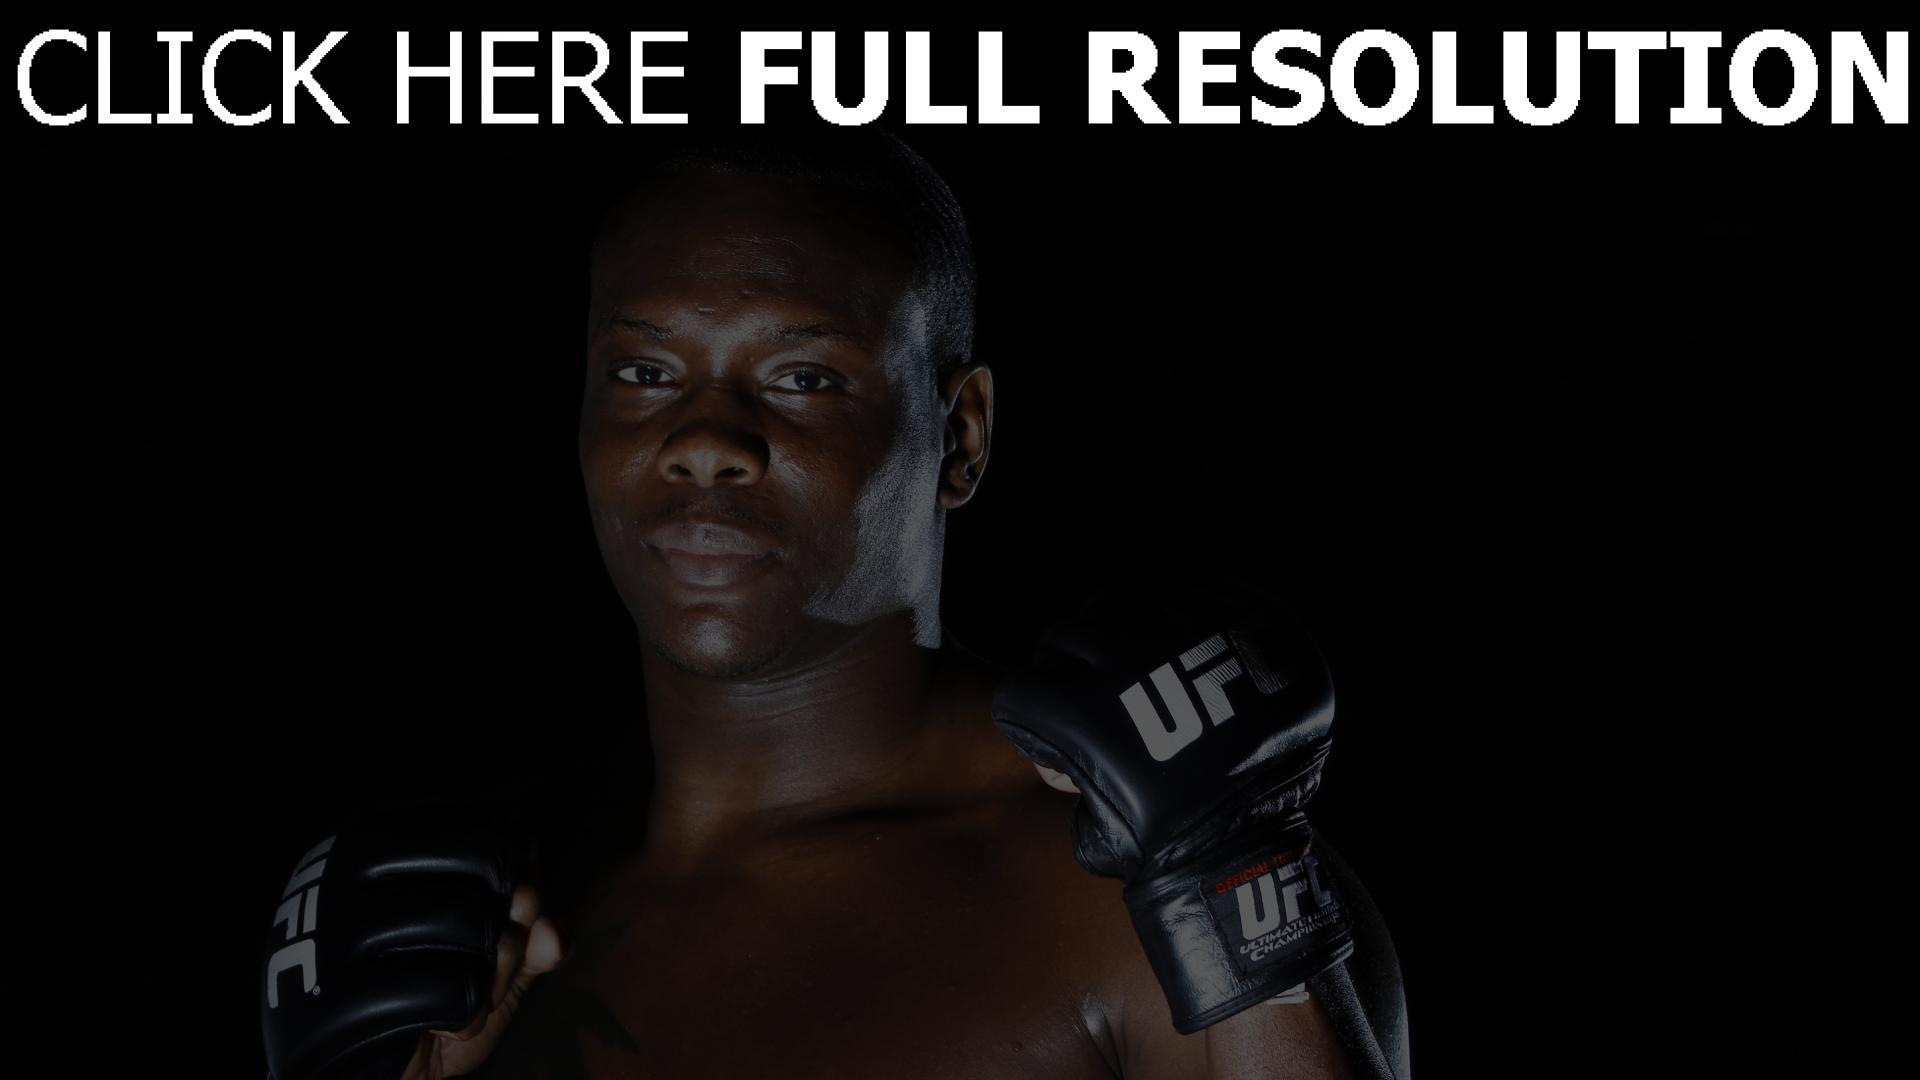 hd hintergrundbilder mma kämpfer ultimate fighting championship ovince saint preux 1920x1080